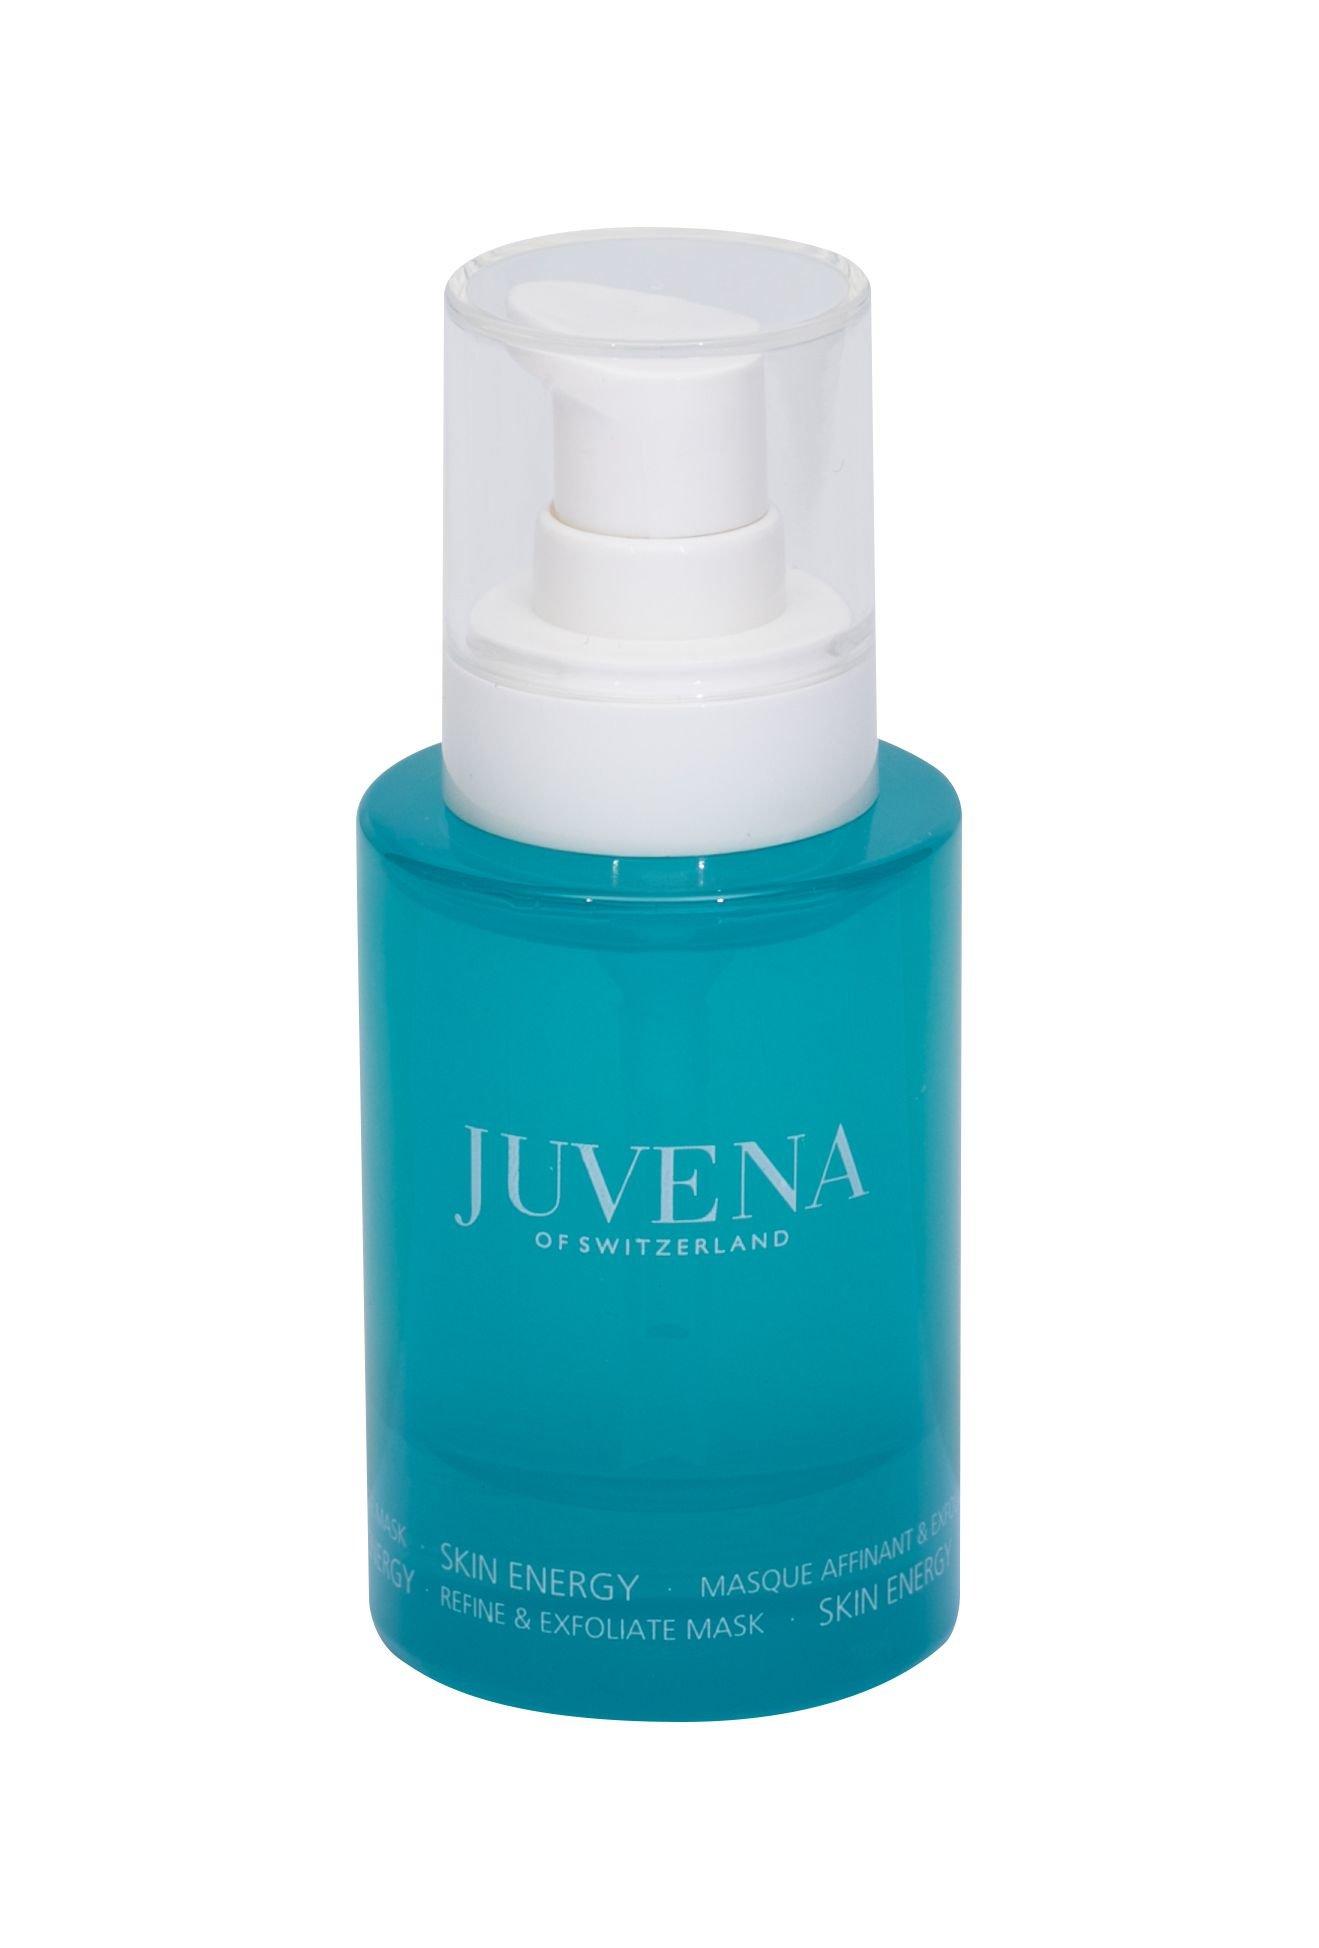 Juvena Skin Energy Face Mask 50ml